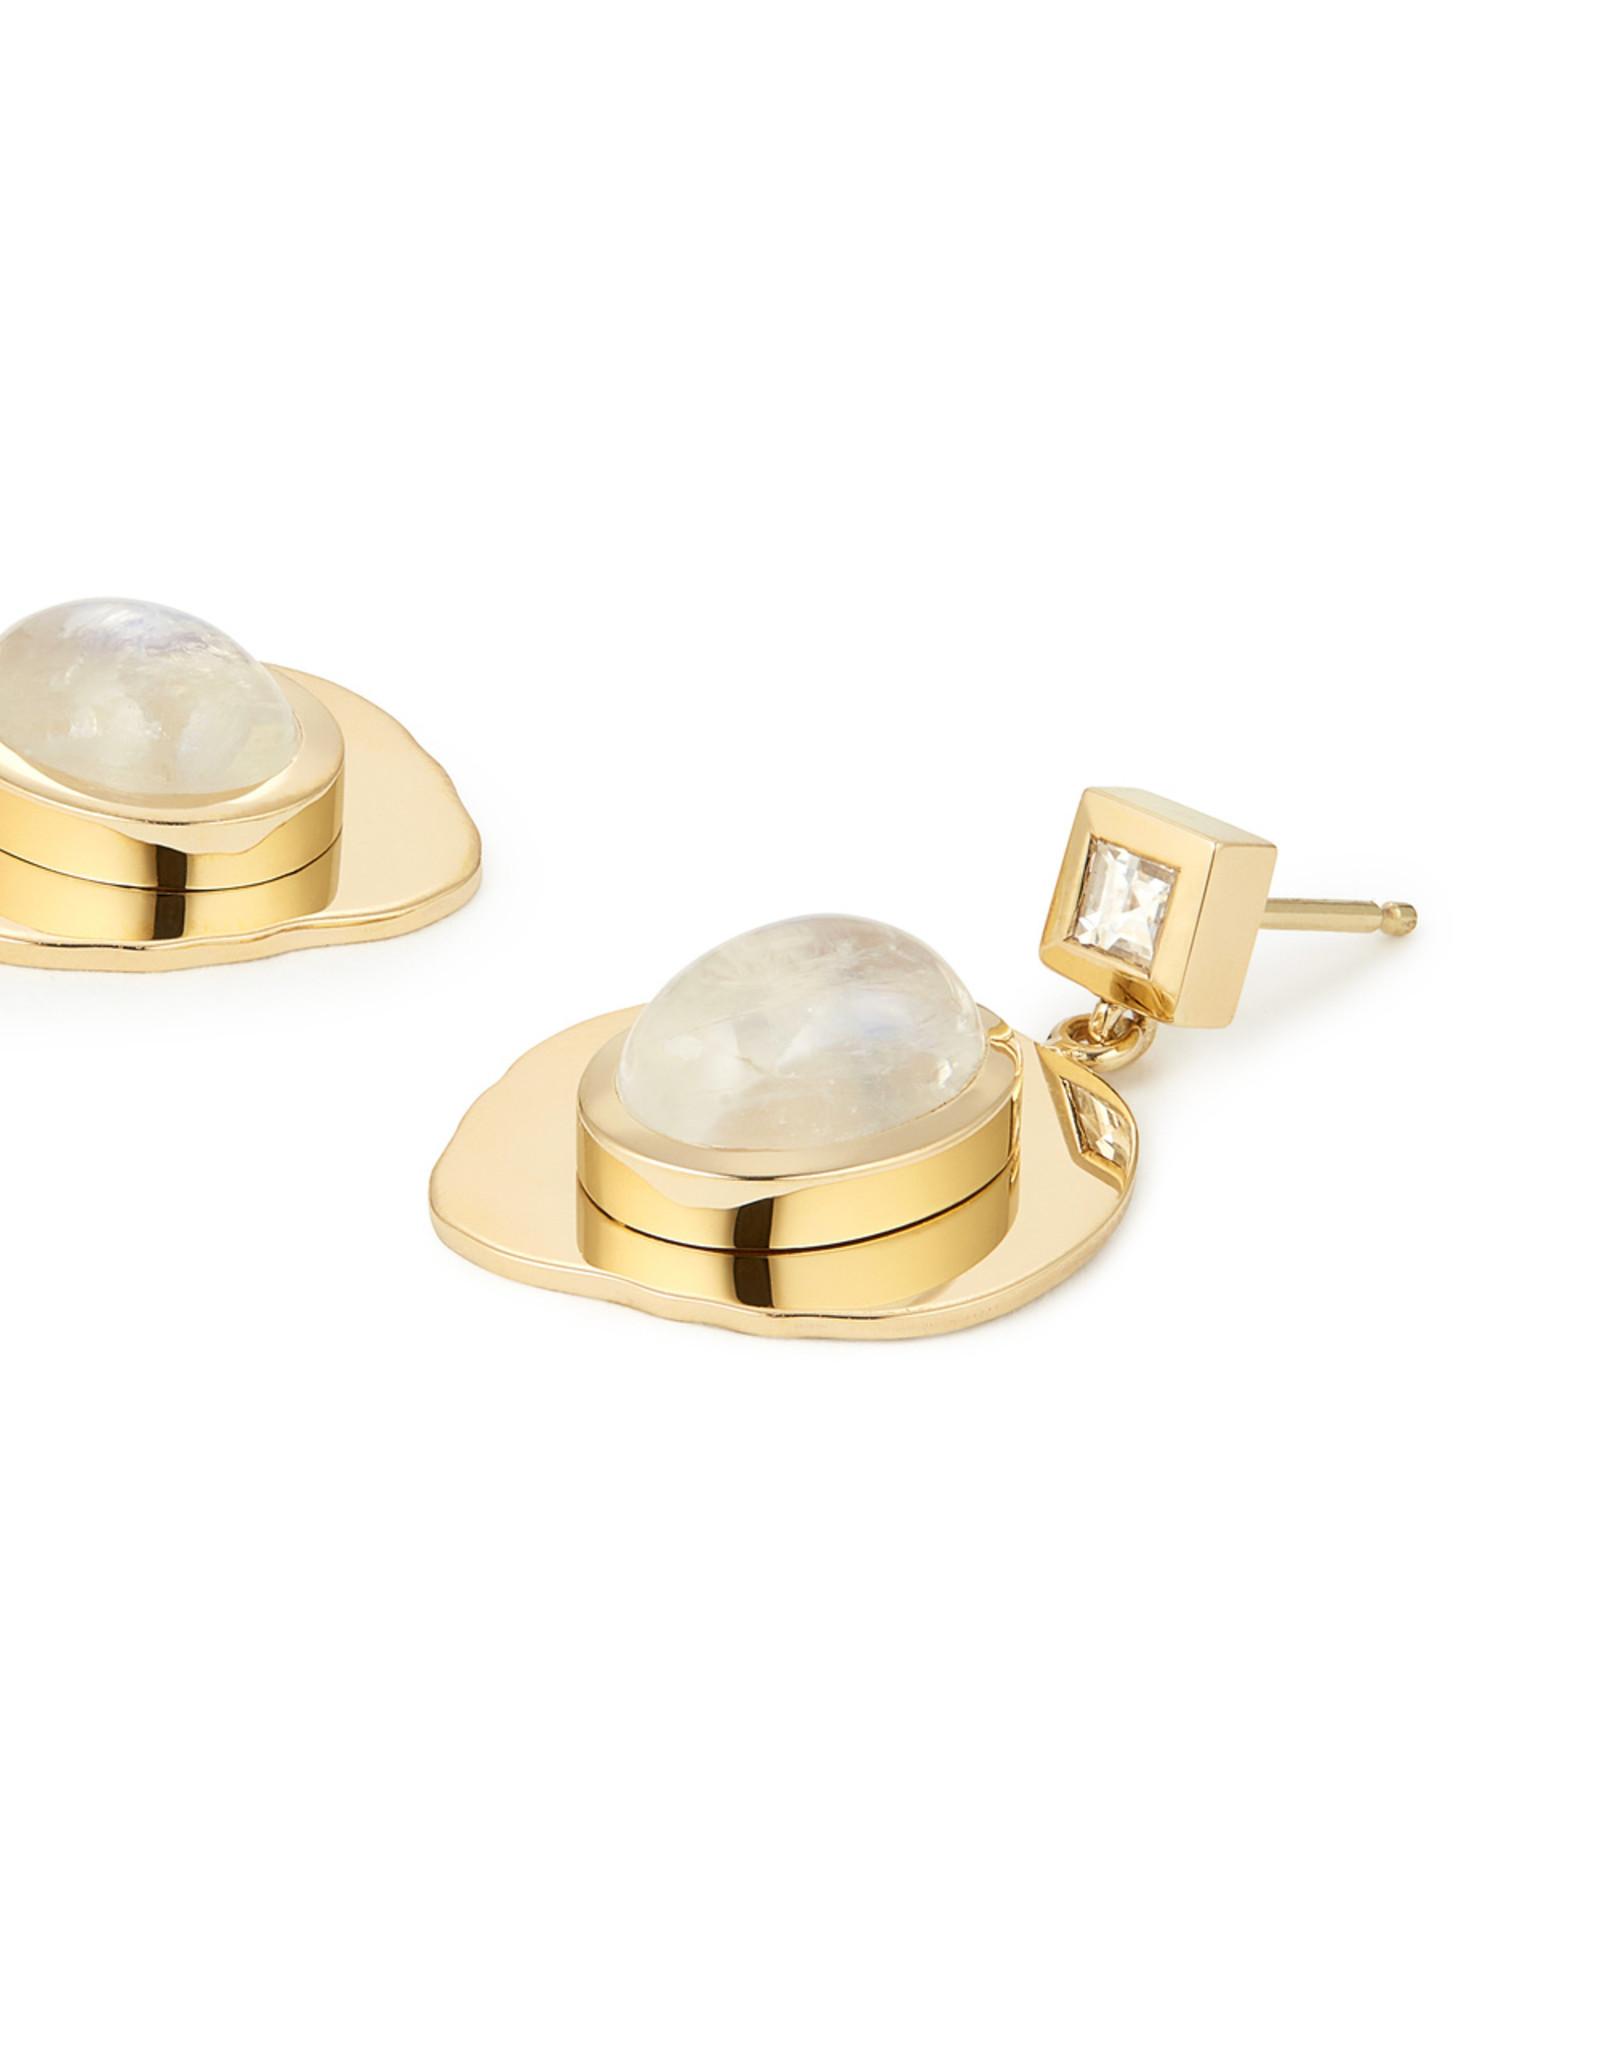 Azlee Azlee Modern Byzantine Moonstone & Diamond Coin Earrings - Yellow Gold / Moonstone